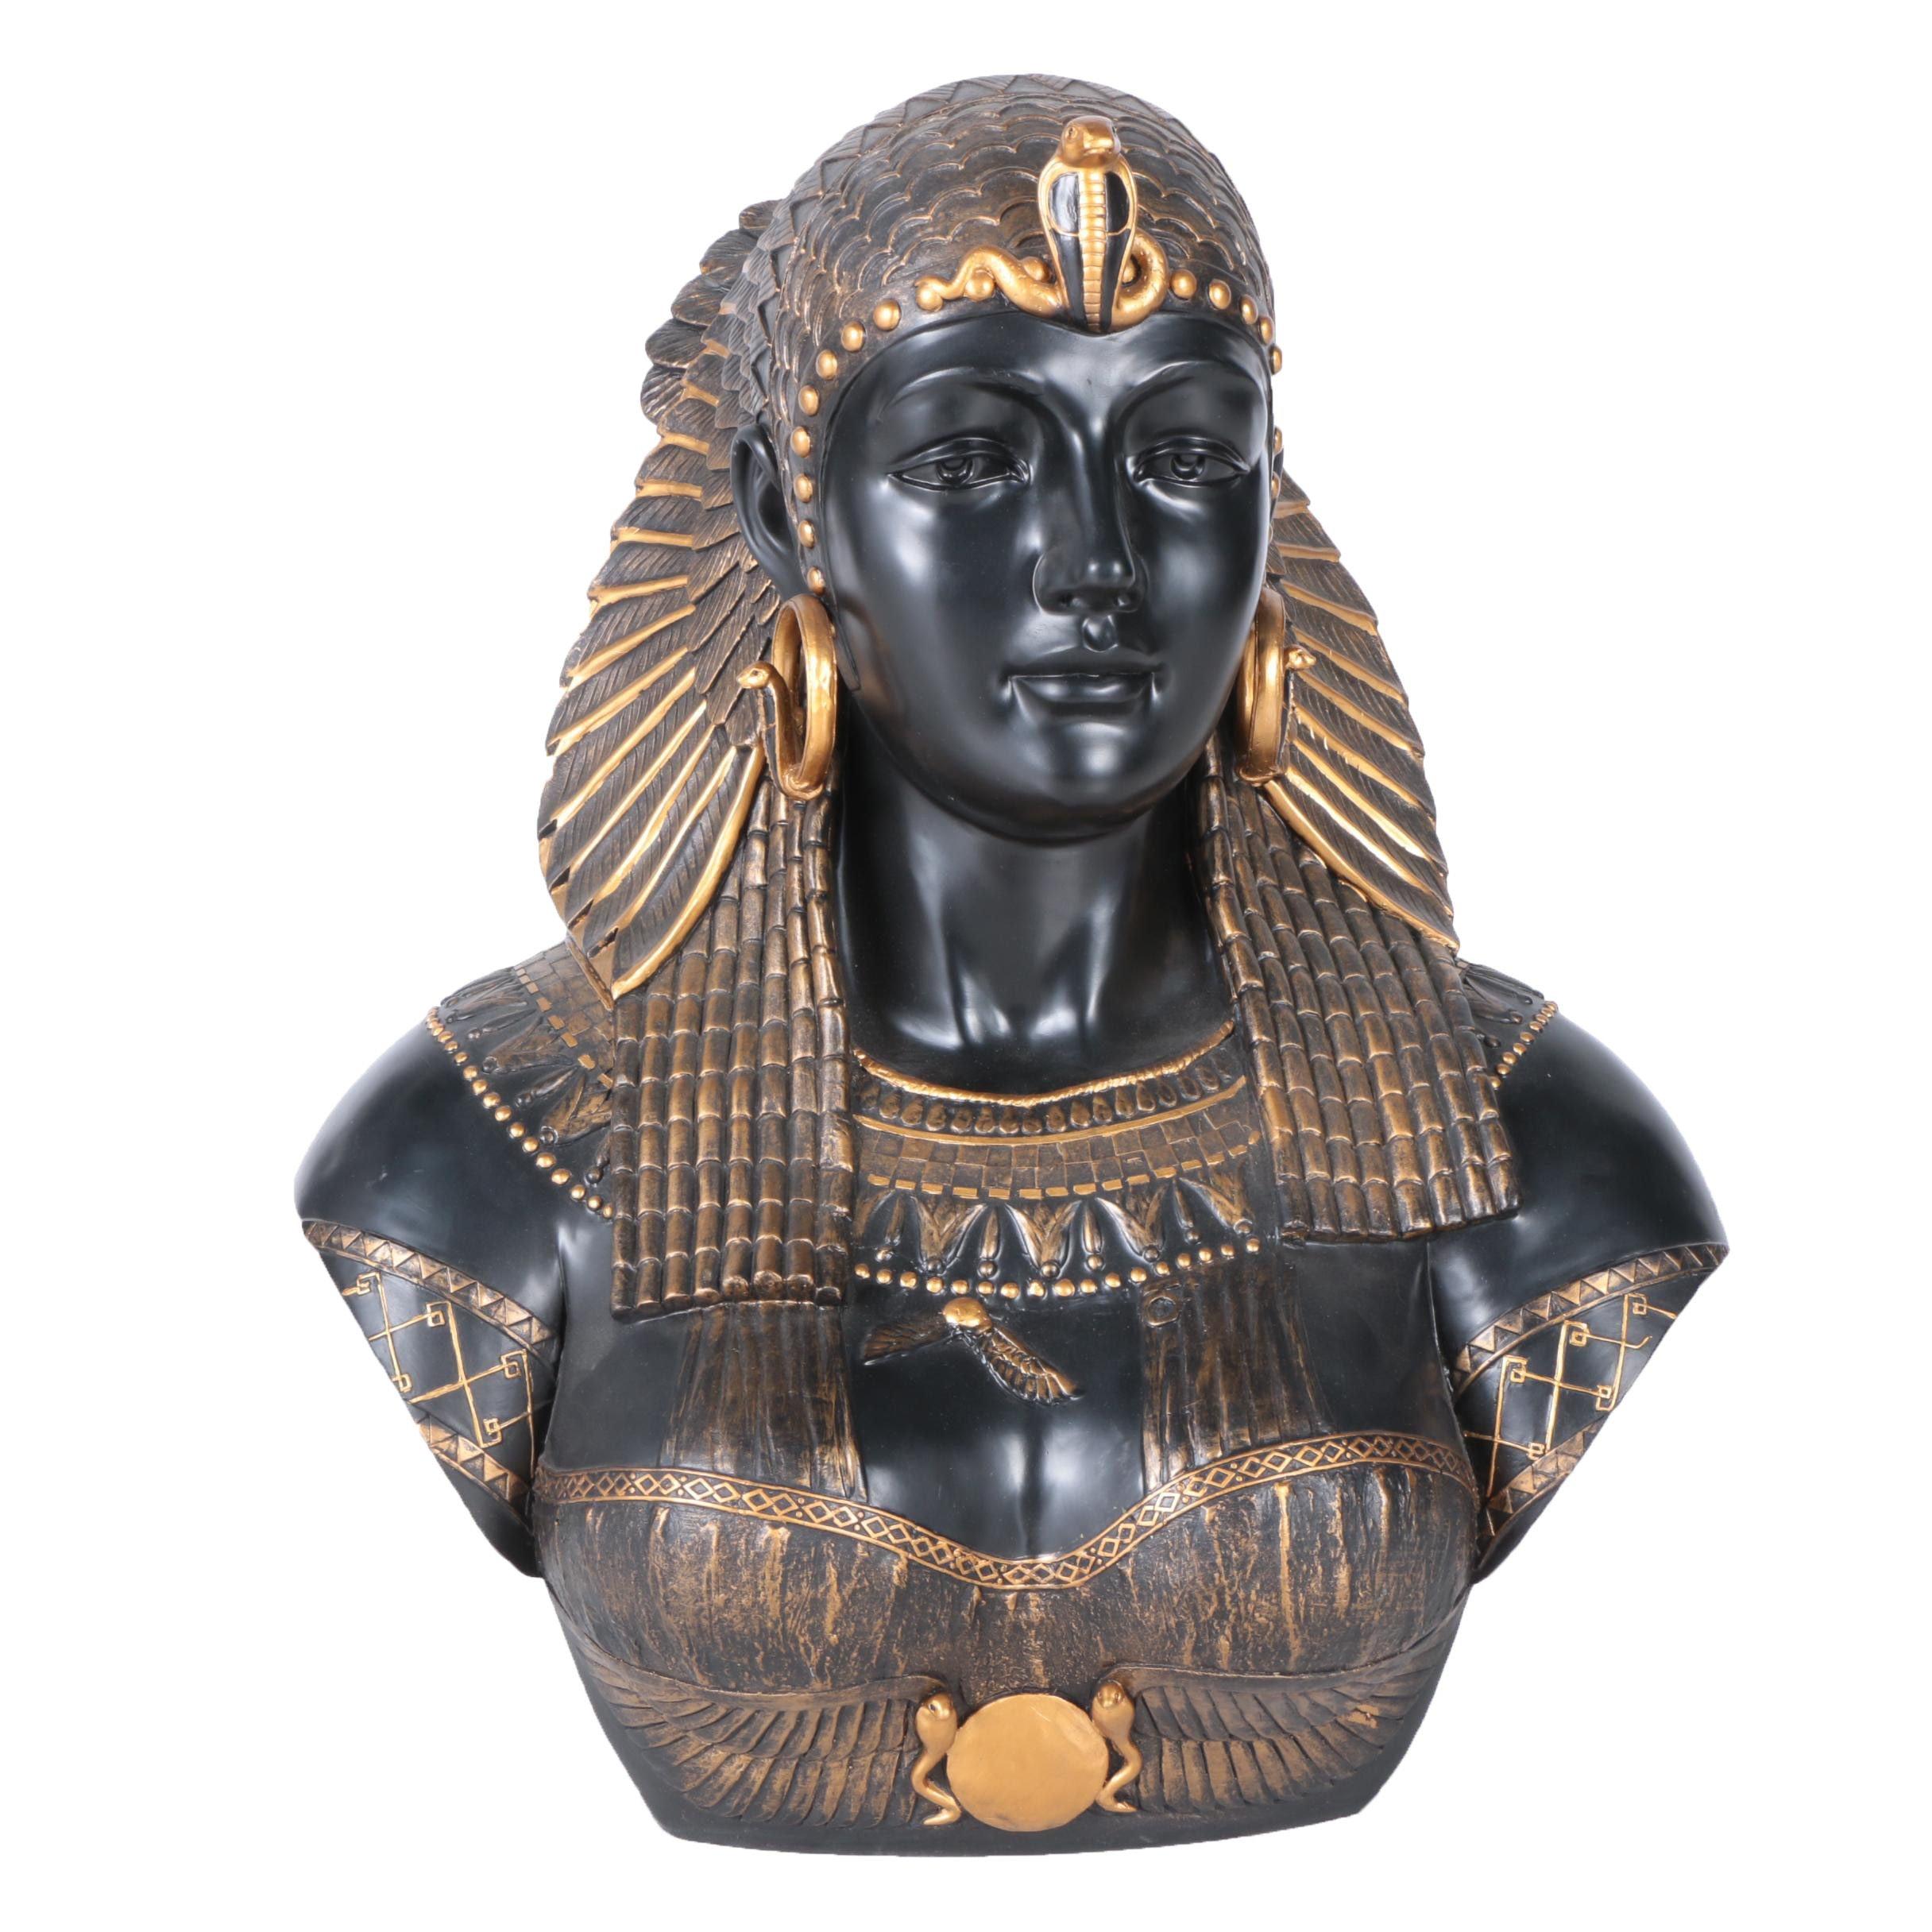 Veronese Cleopatra Bust Sculpture